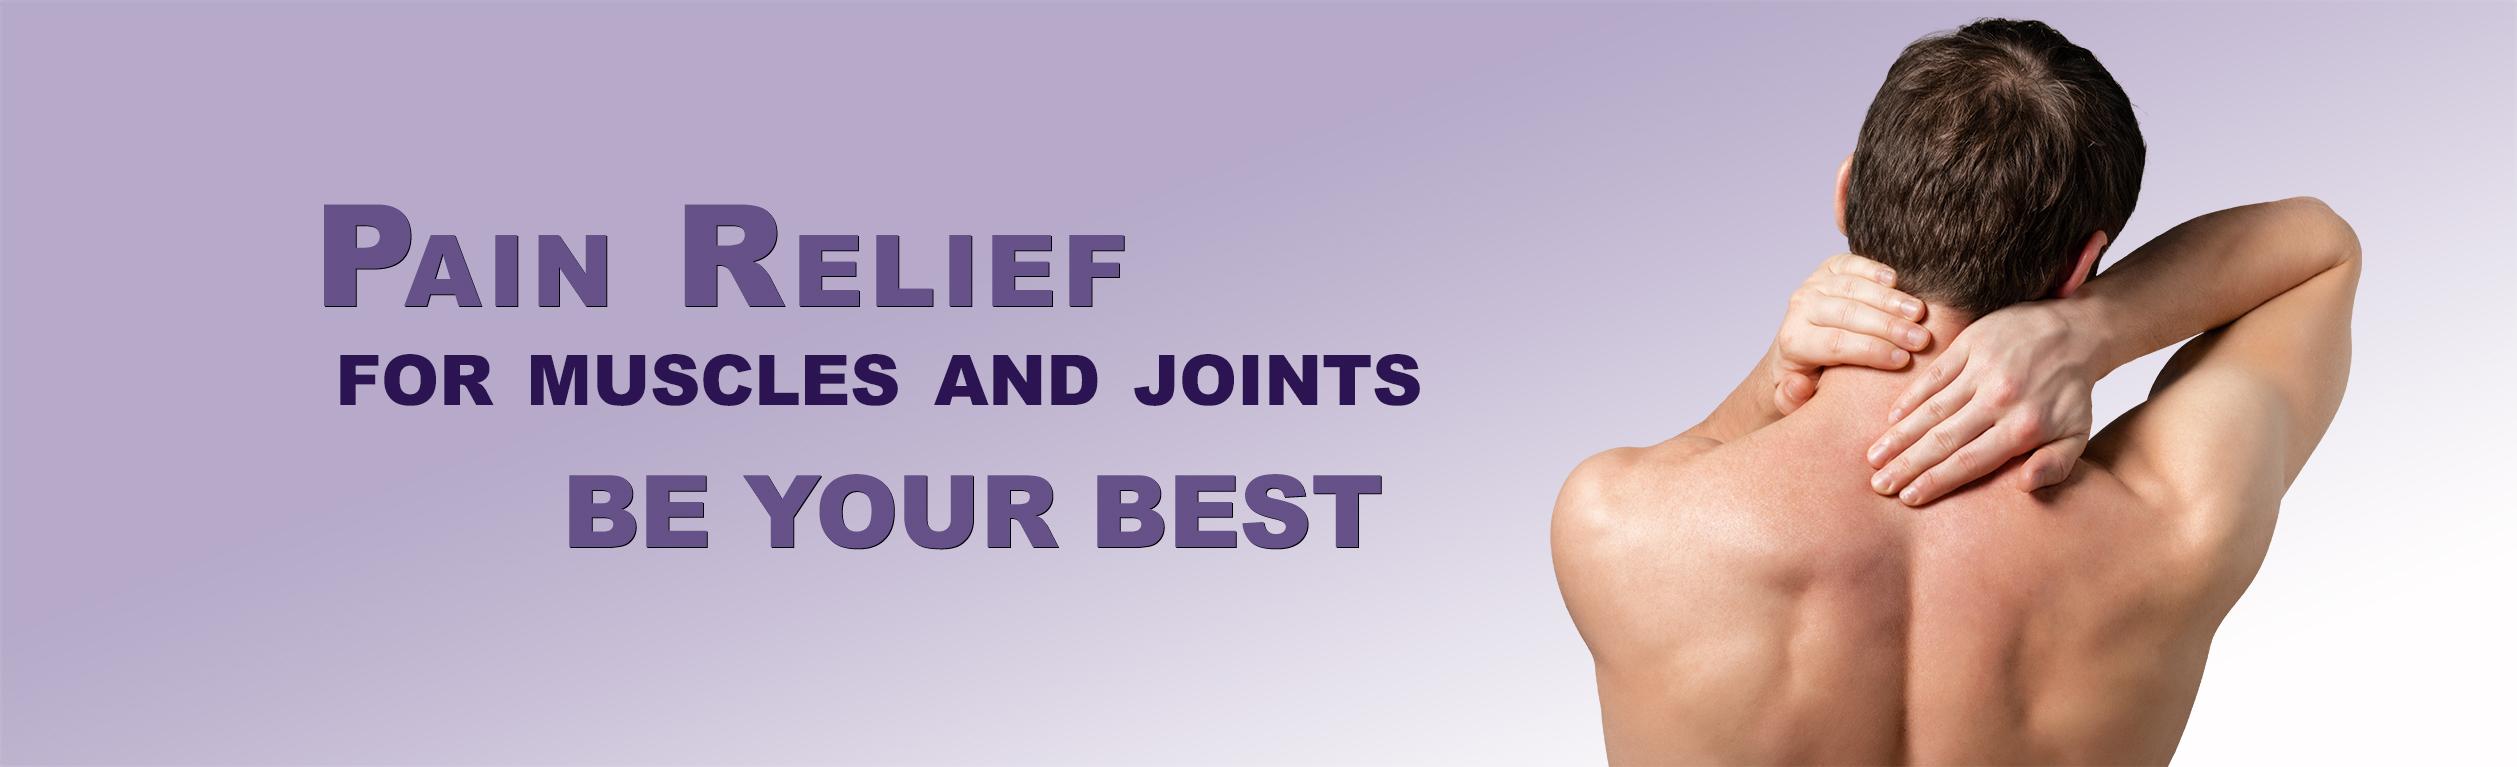 101-Pain-Relief-Banner.jpg